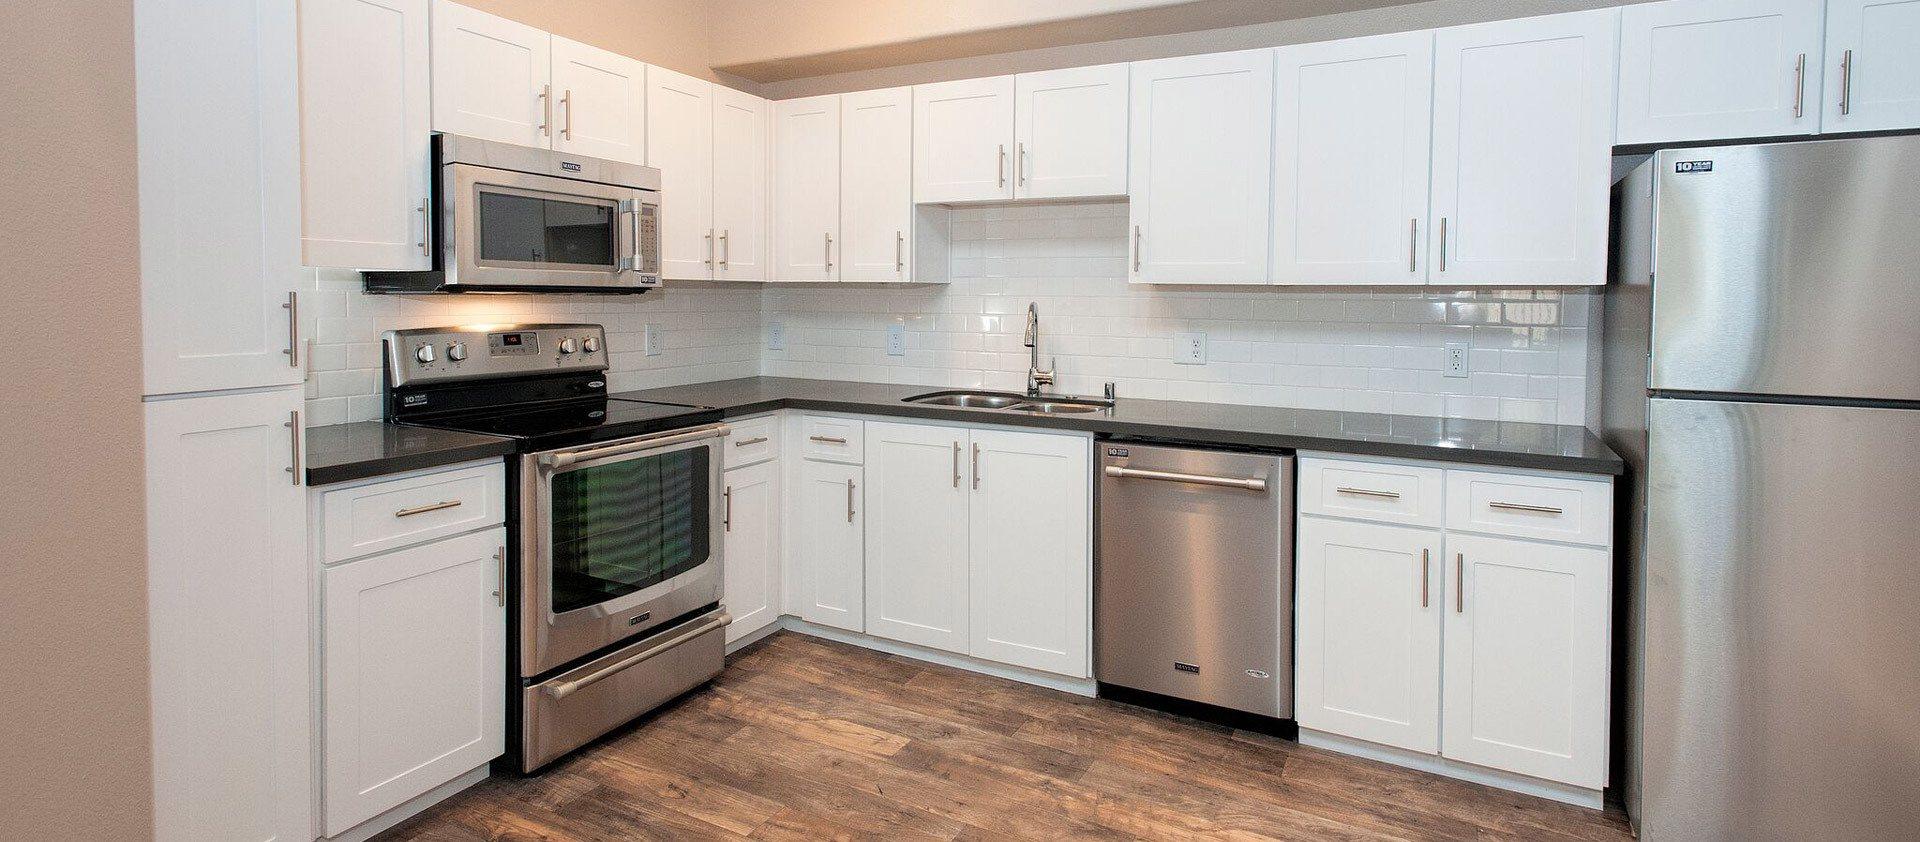 White shaker style cabinets at Venu at Galleria Condominium Rentals in Roseville, CA